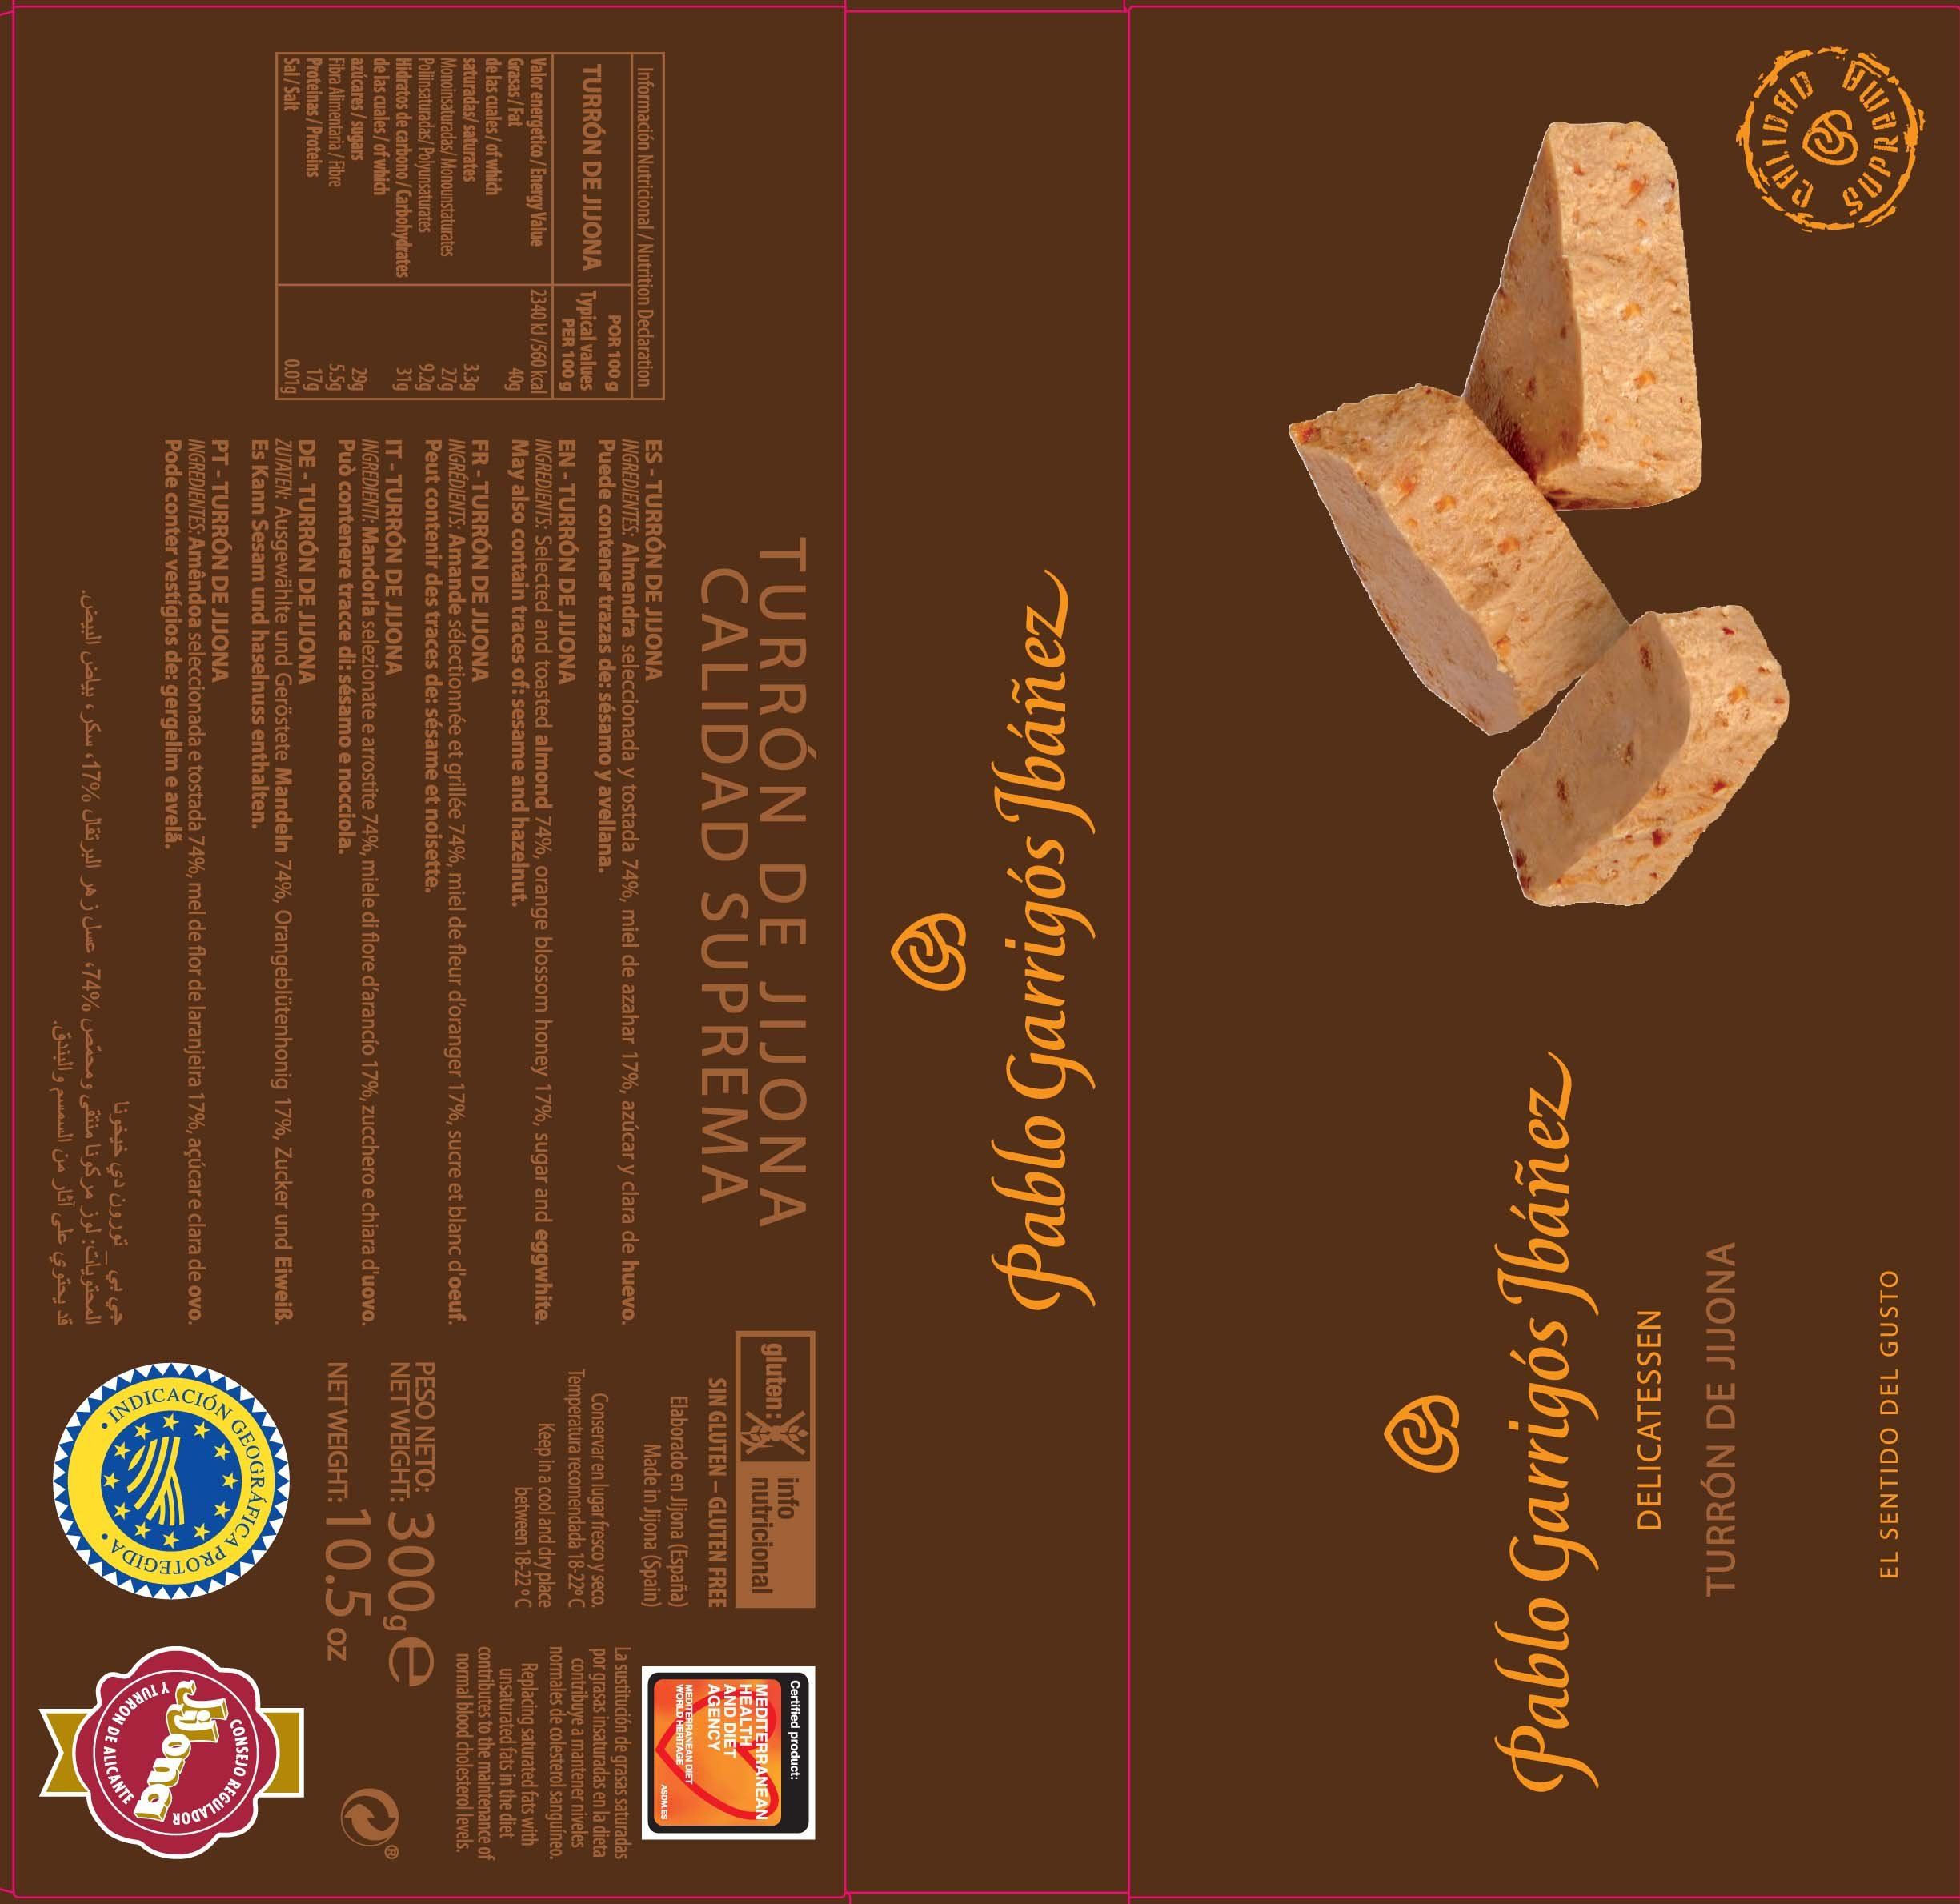 Pablo Garrigos Ibáñez Delicatessen Turron de Jijona (Soft Almond Turron) 10.5 oz (300 grm) (Pack of 12) by Pablo Garrigos Ibáñez (Image #2)